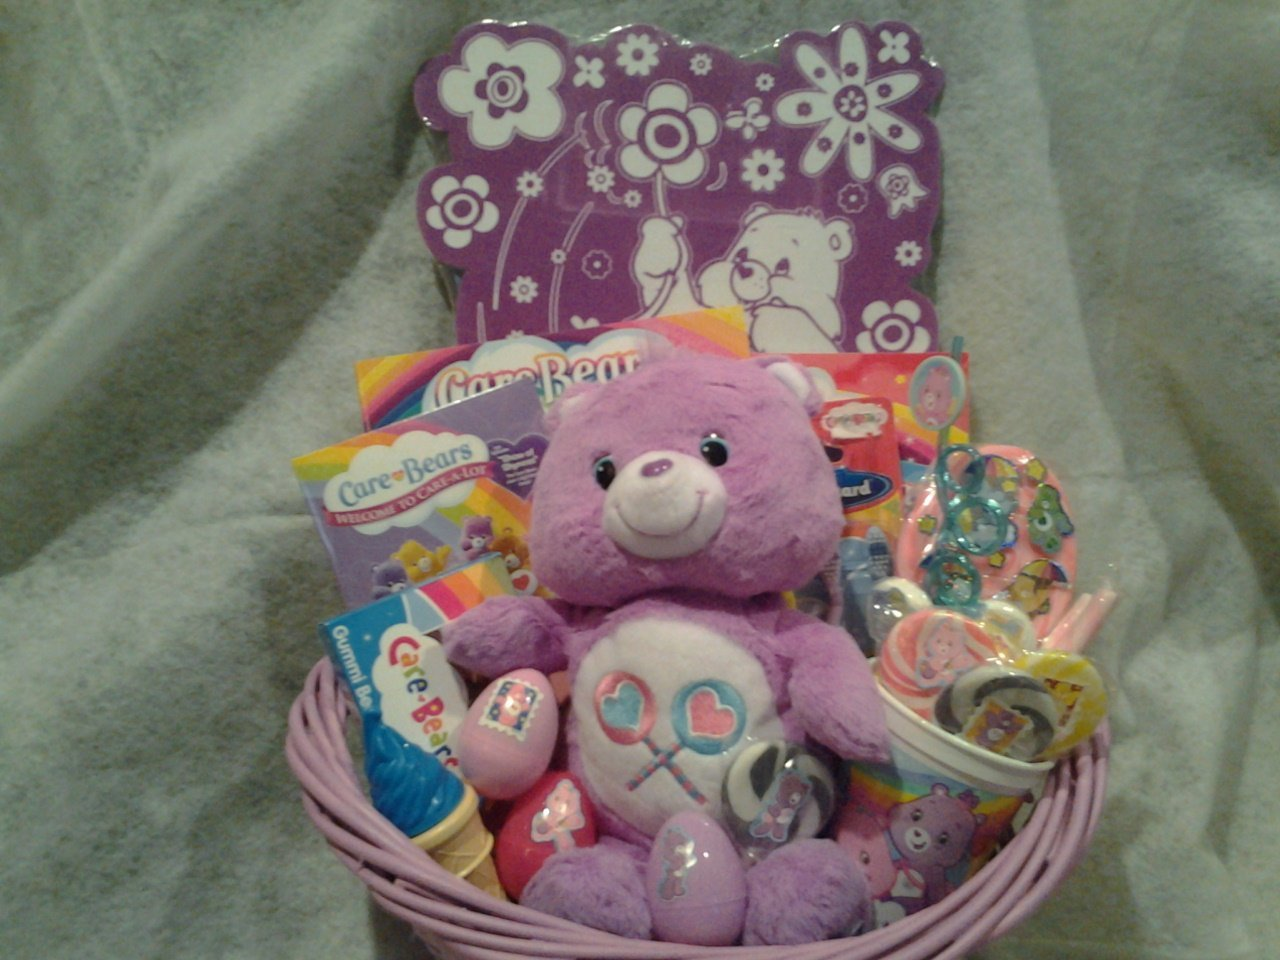 CareBears Gift Basket